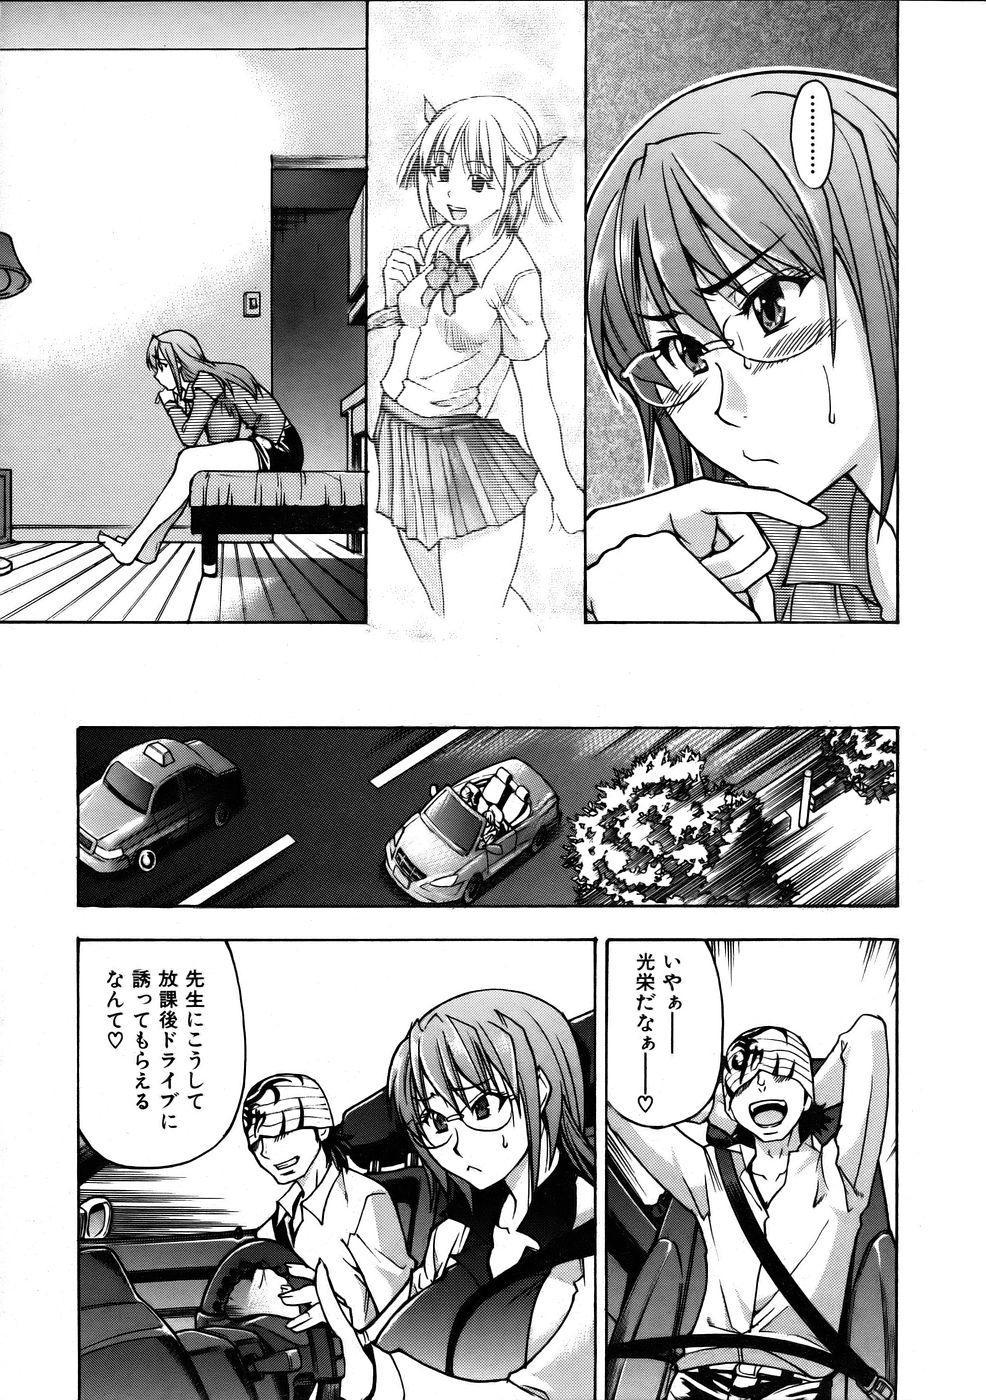 COMIC AUN 2005-10 Vol. 113 26